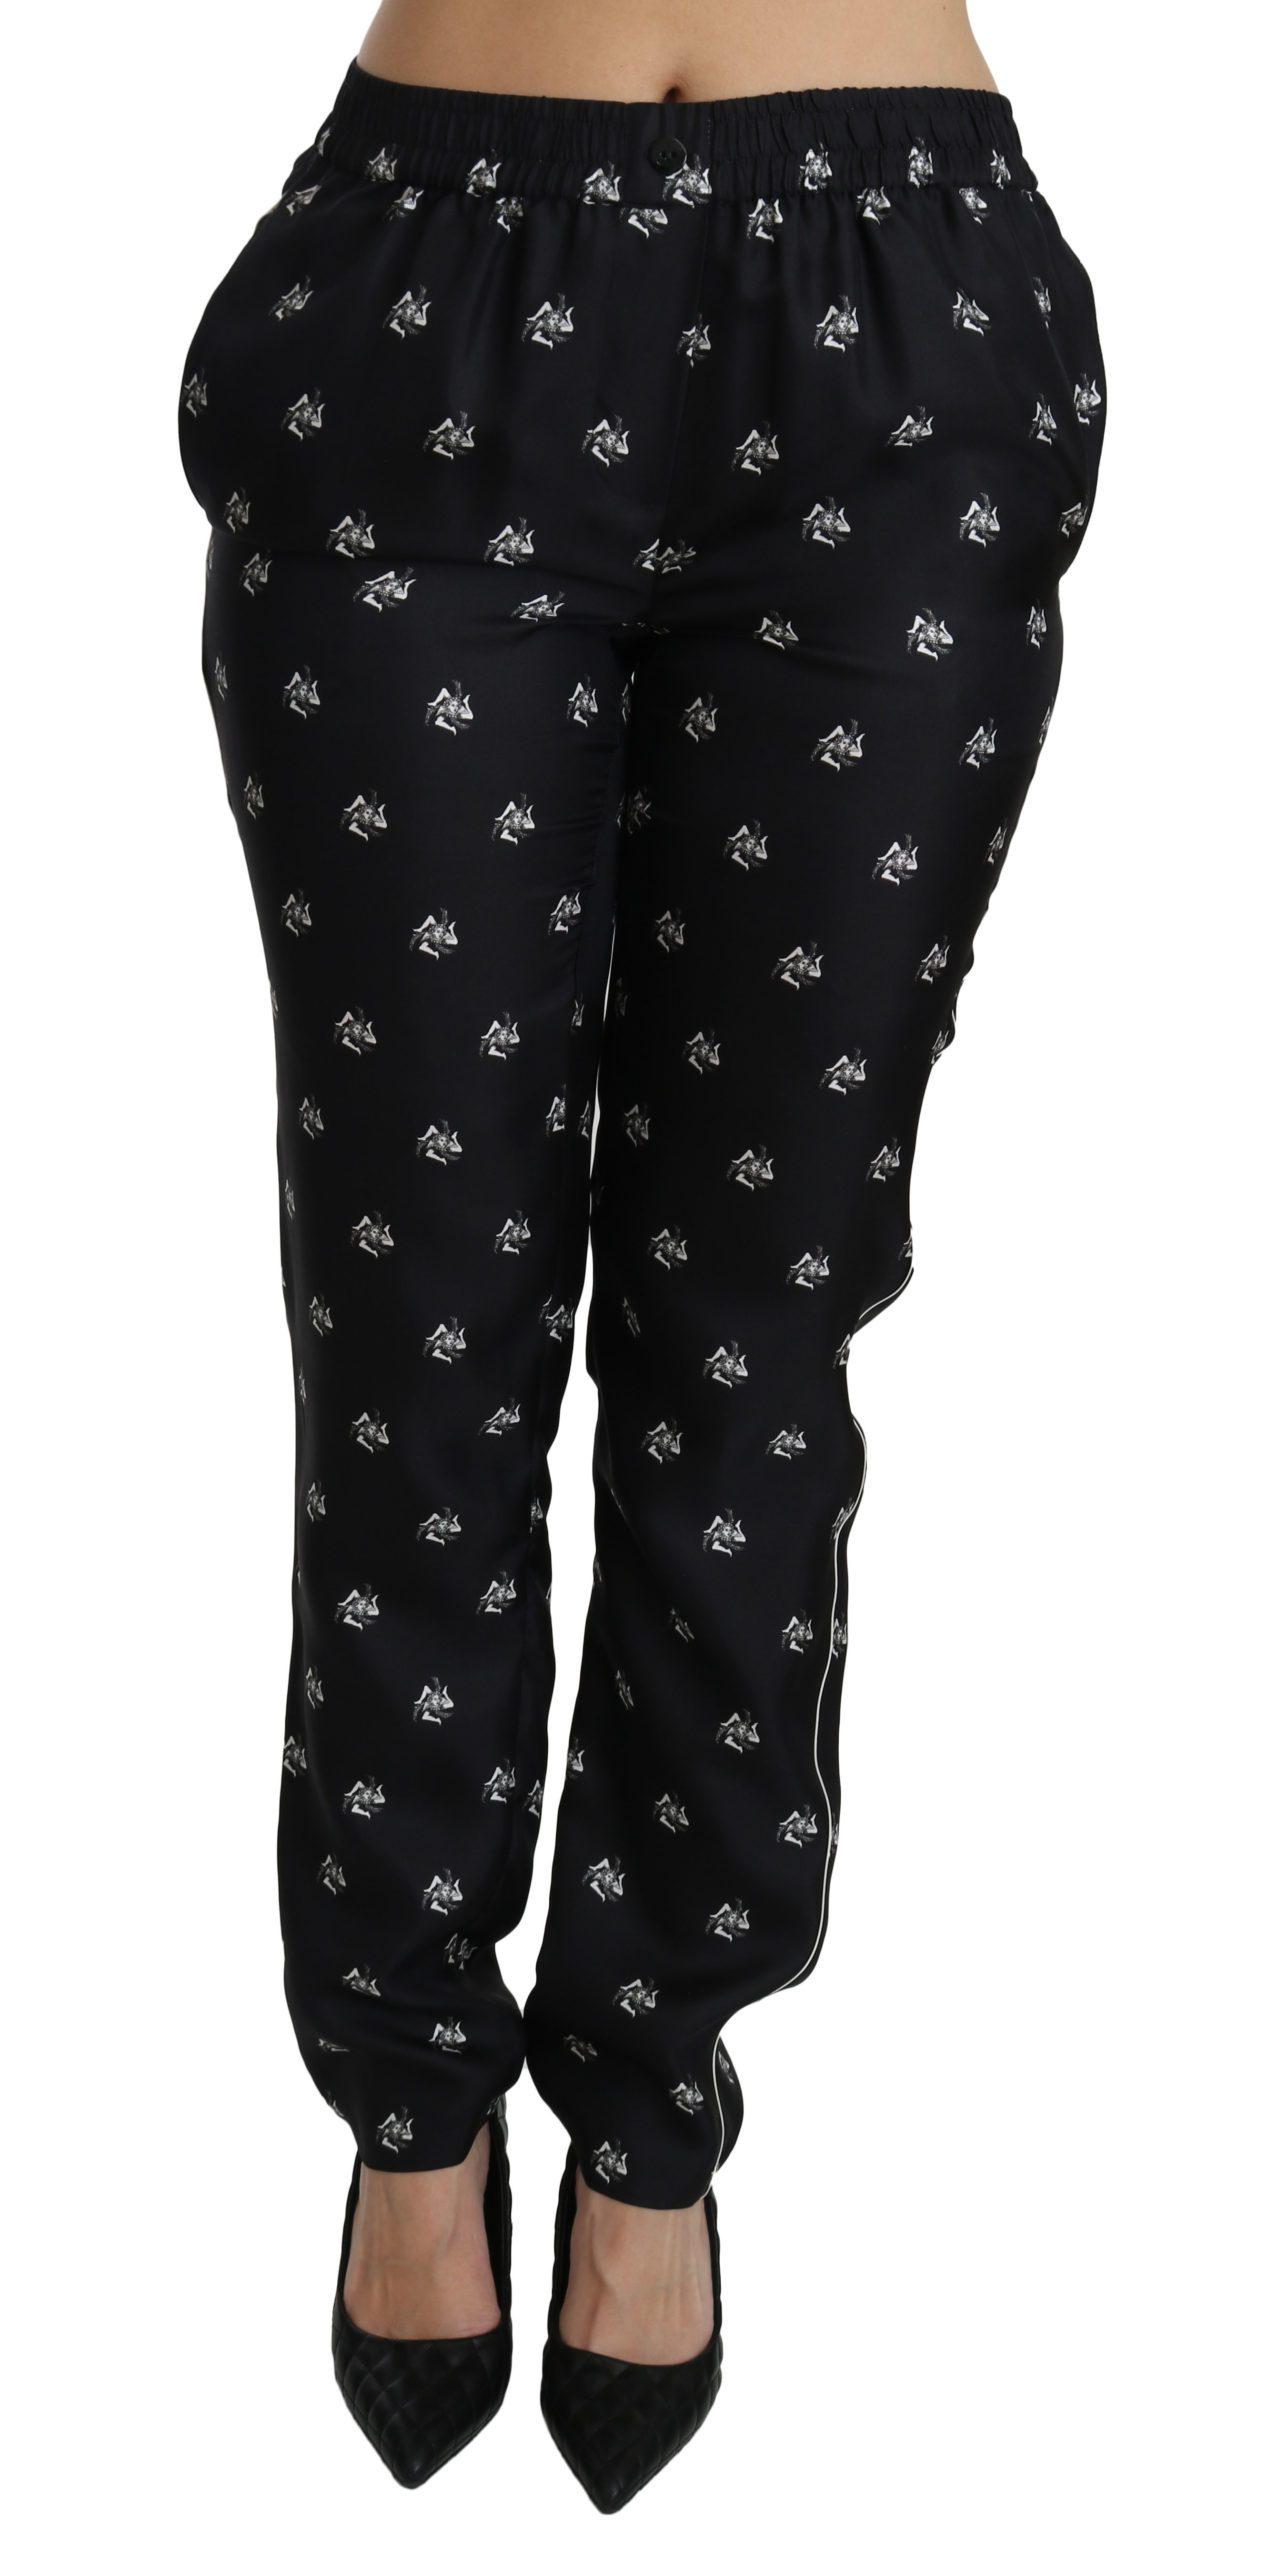 Dolce & Gabbana Women's Printed Mid Waist Skinny Silk Trouser Black PAN70866 - IT42|M